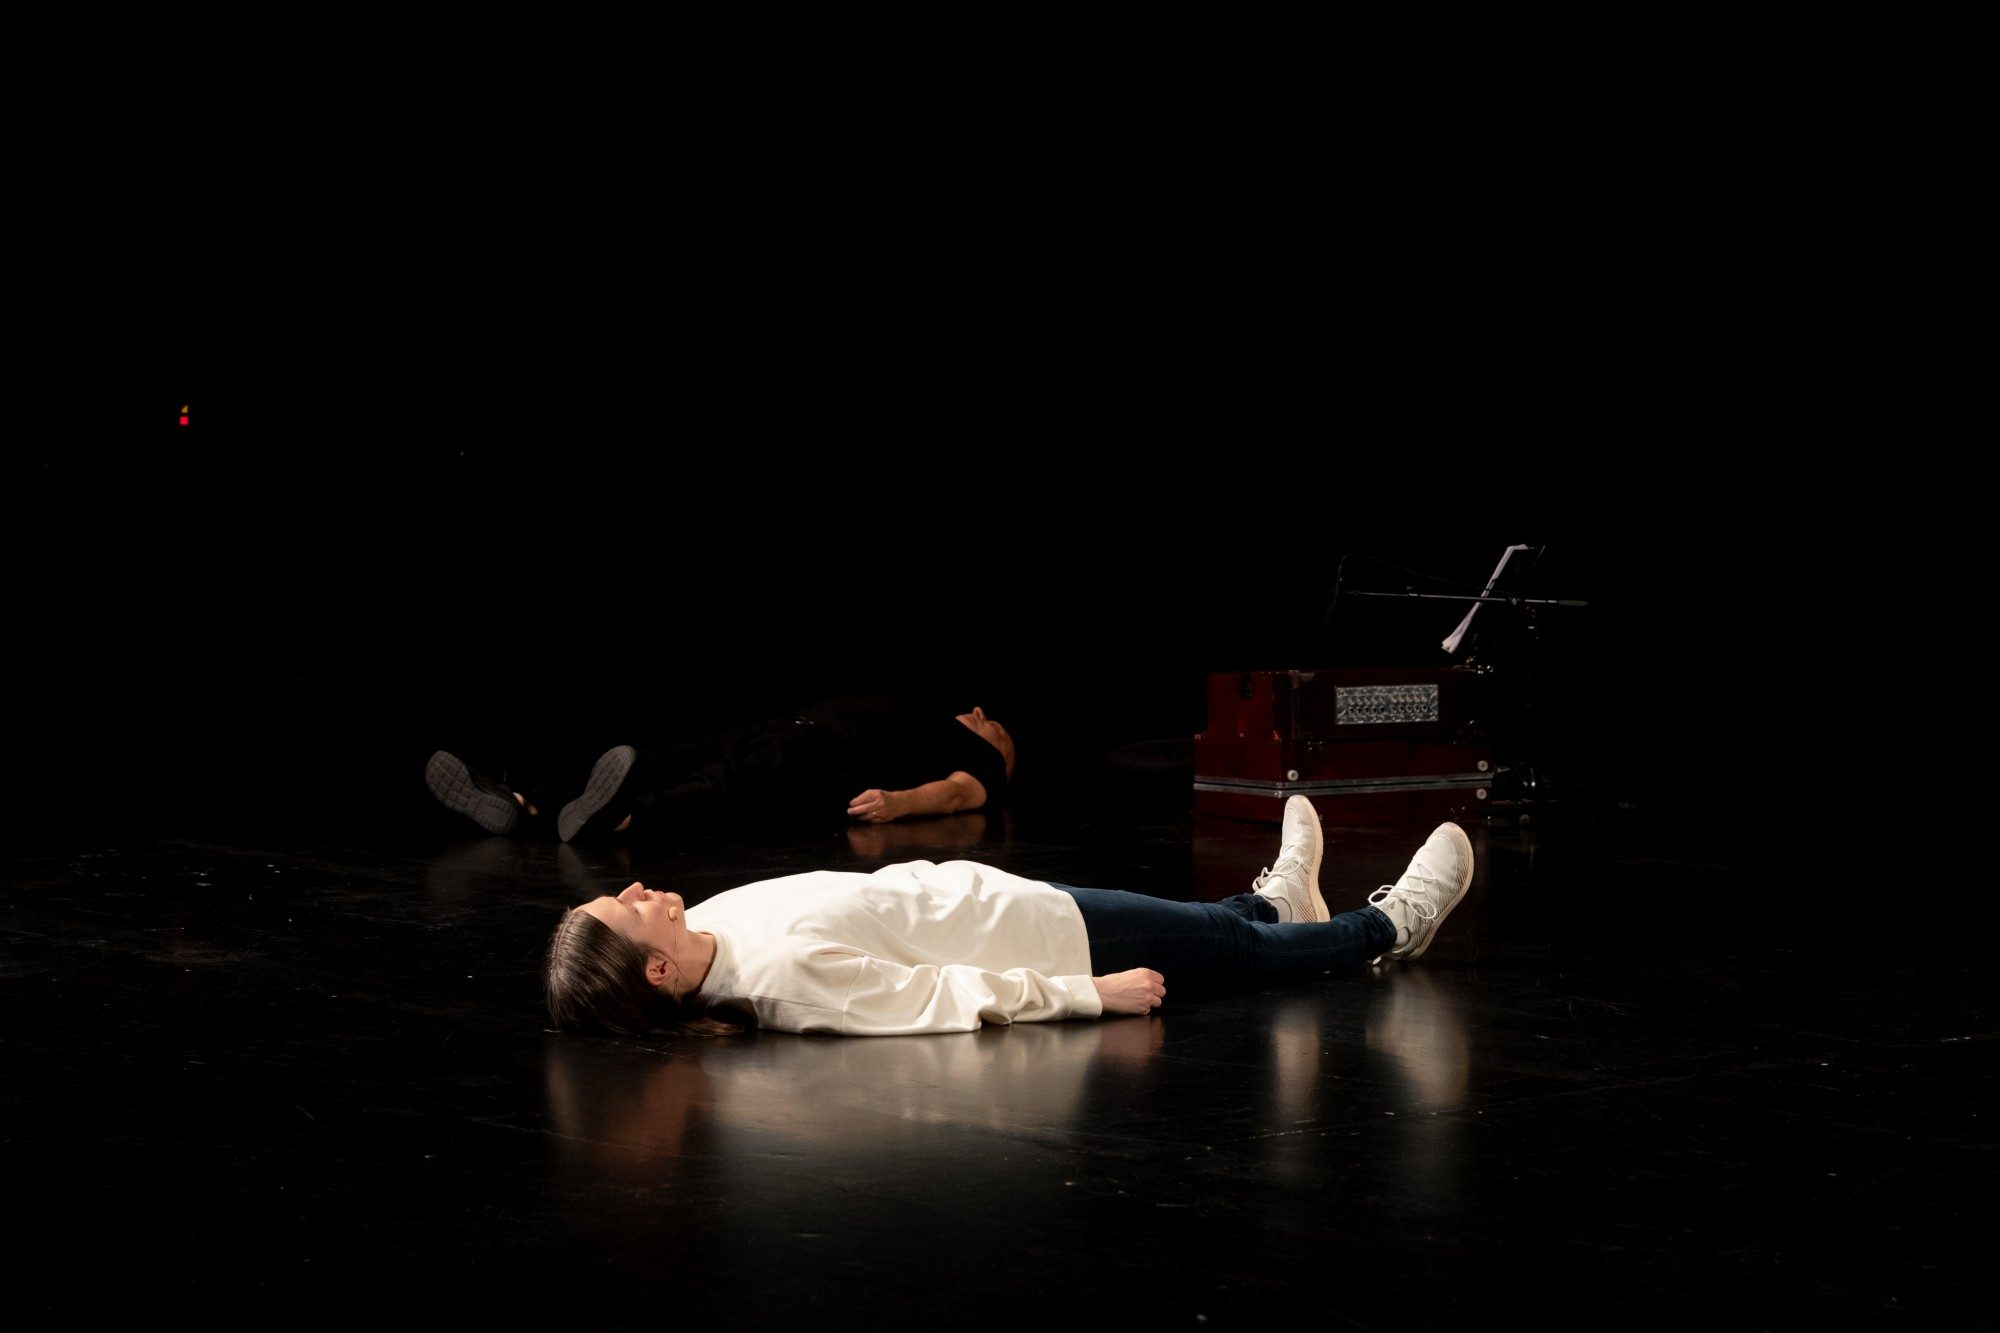 'Penelope Sleeps' (2019), Mette Edvardsen & Matteo Fargion. Photo by Werner Strouven.